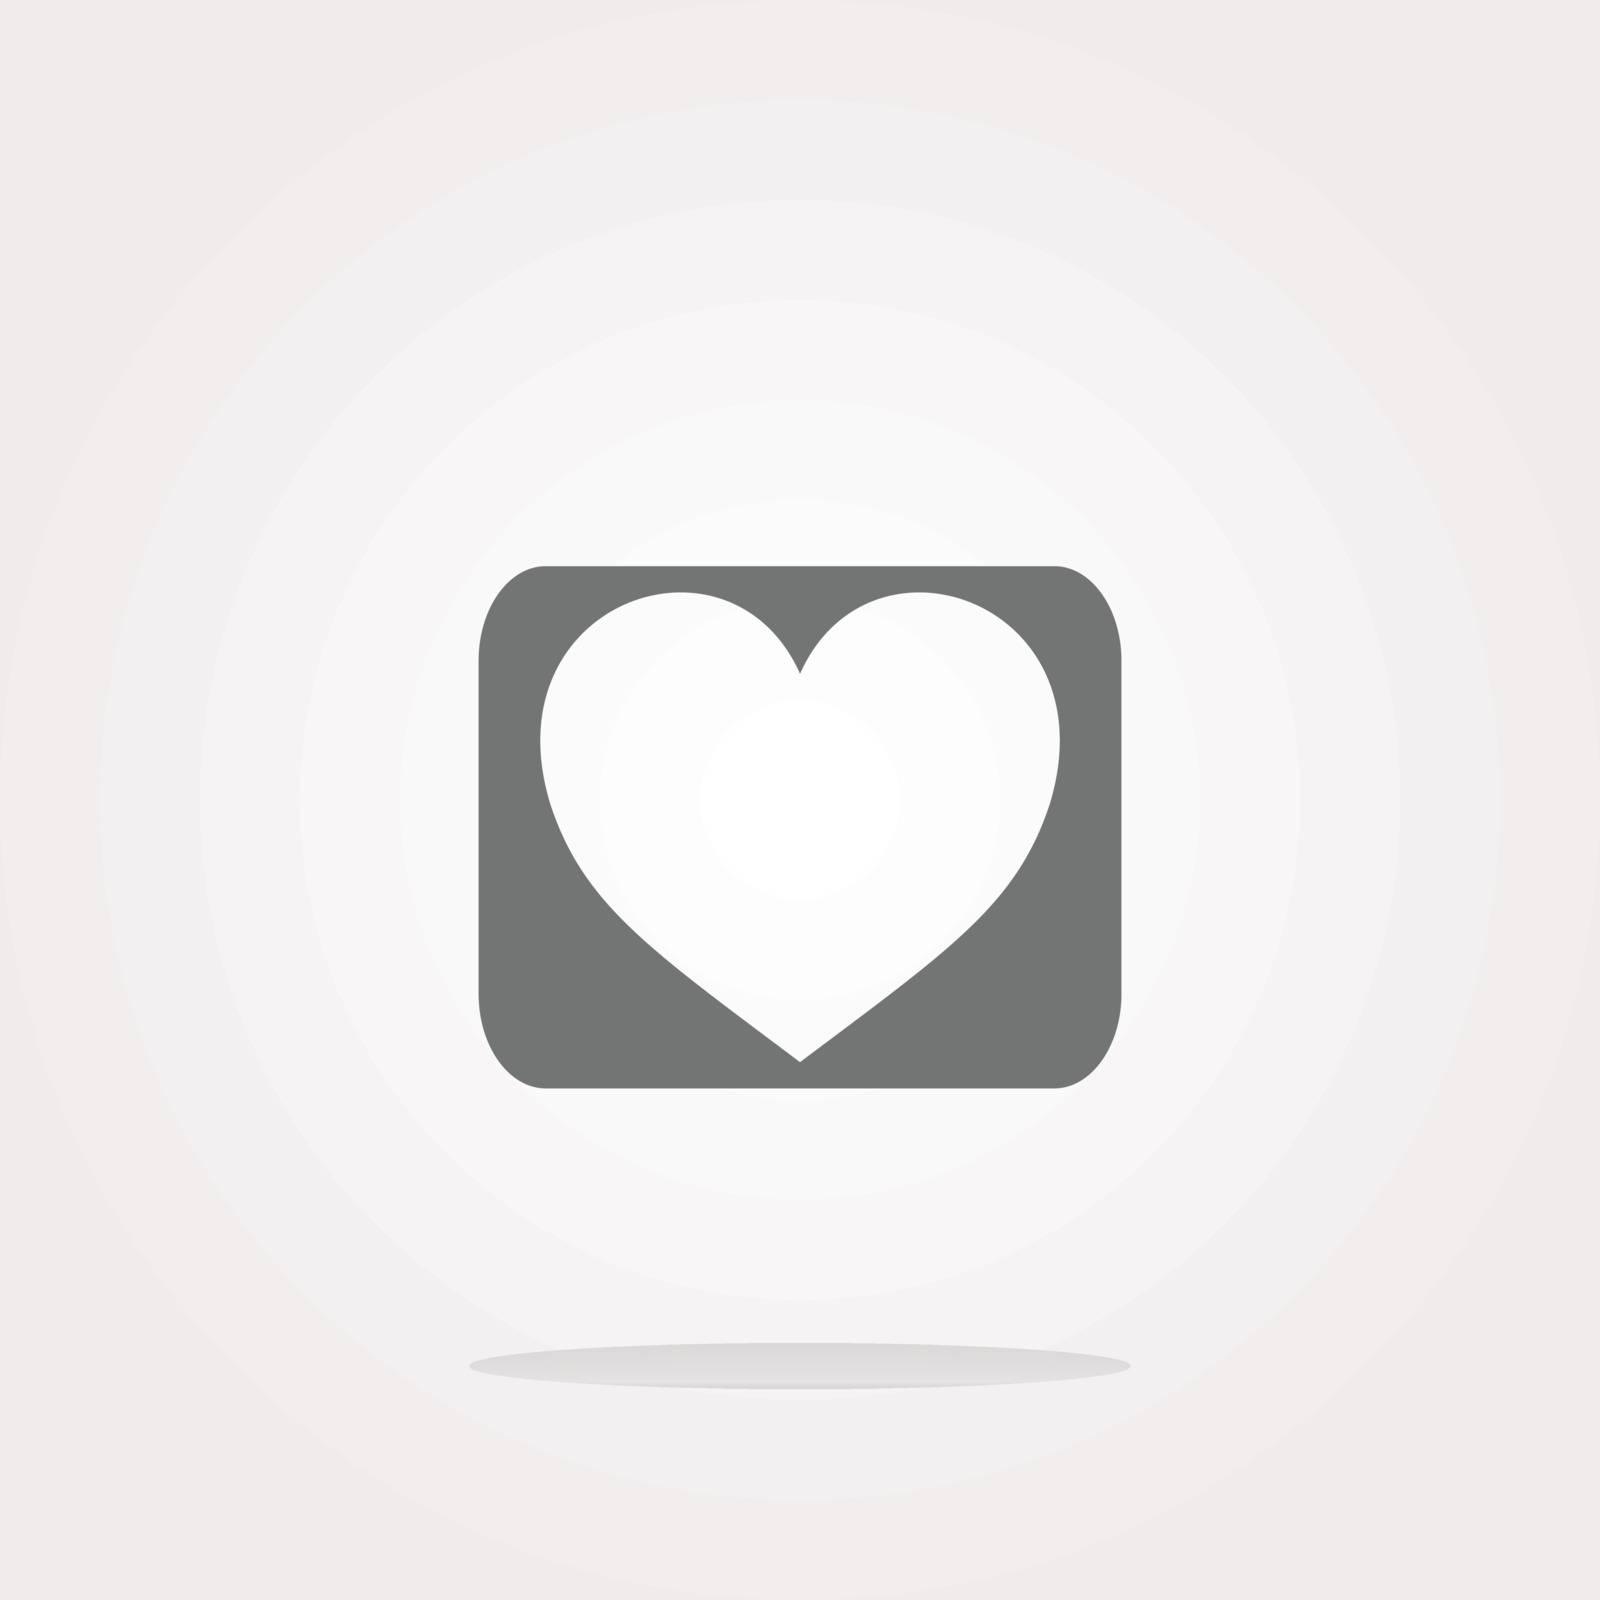 Heart Icon Vector. Heart Icon JPEG. Heart Icon Object. Heart Icon Picture. Heart Icon Image. Heart Icon Graphic. Heart Icon Art. Heart Icon AI. Heart Icon Drawing